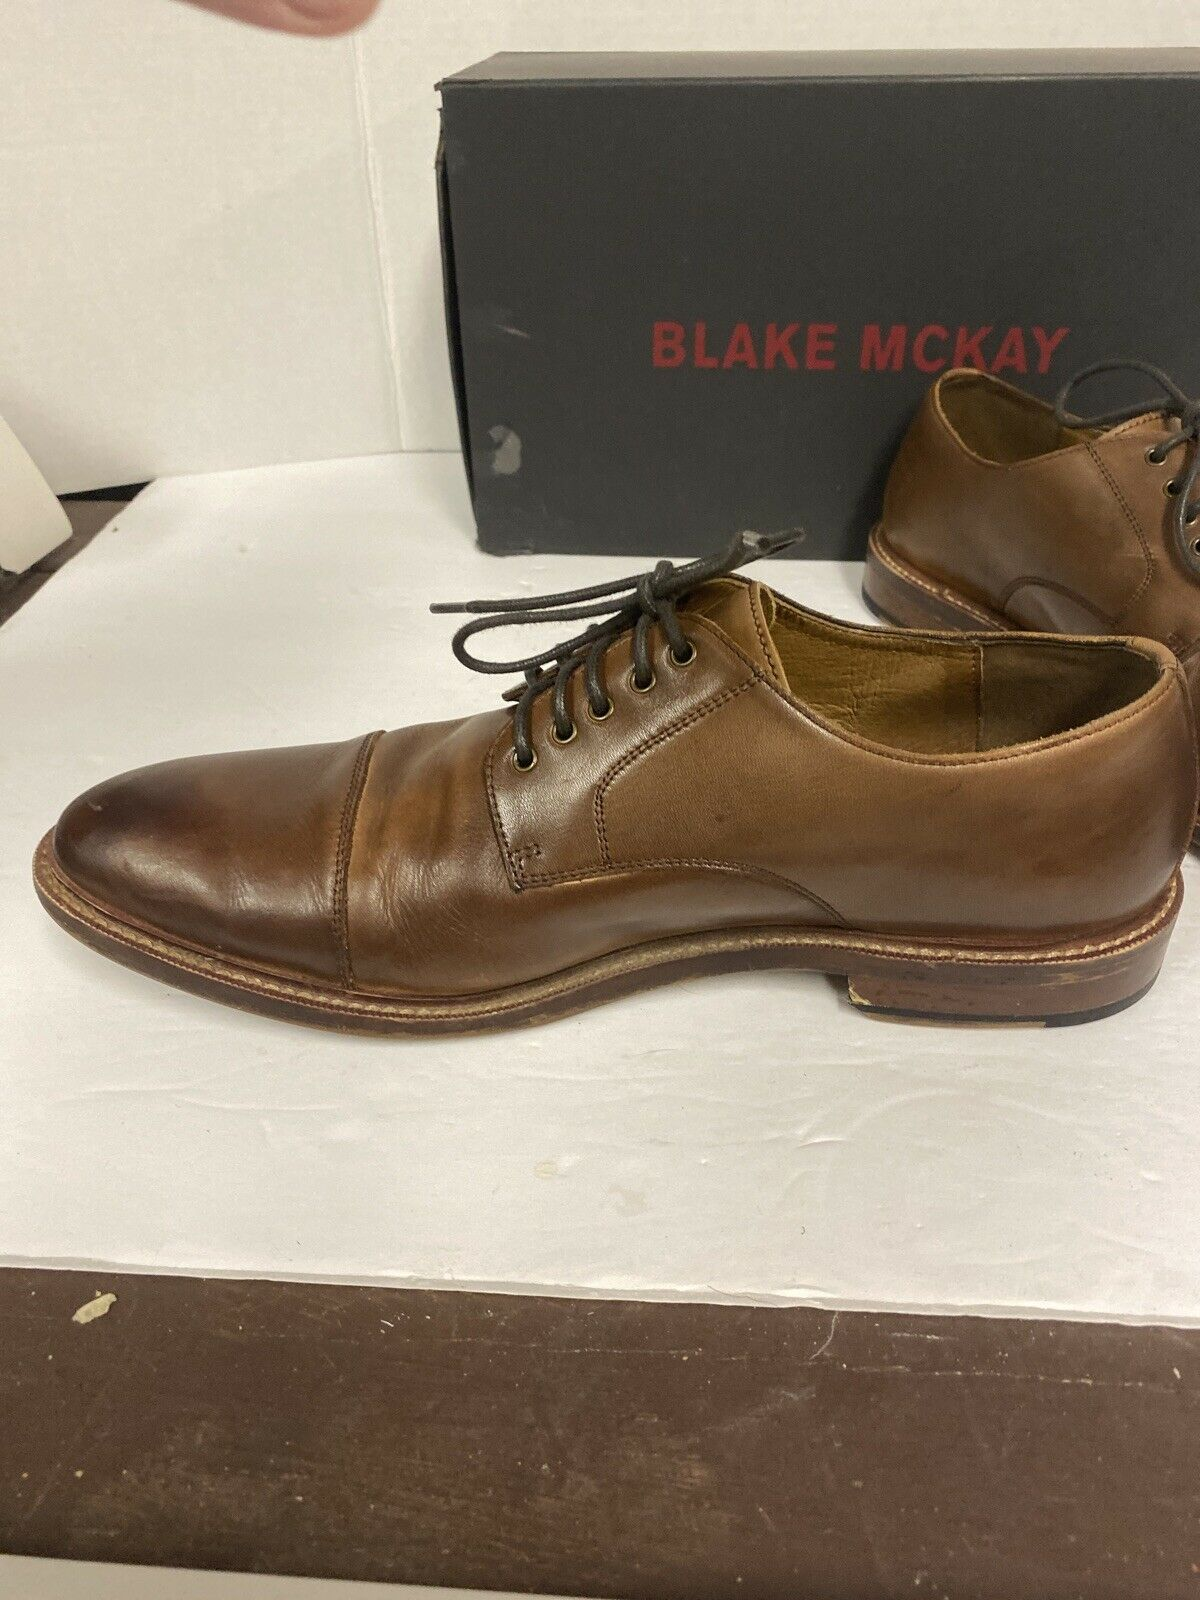 New BLAKE MCKAY CLARK T9 CAP TOE OXFORD